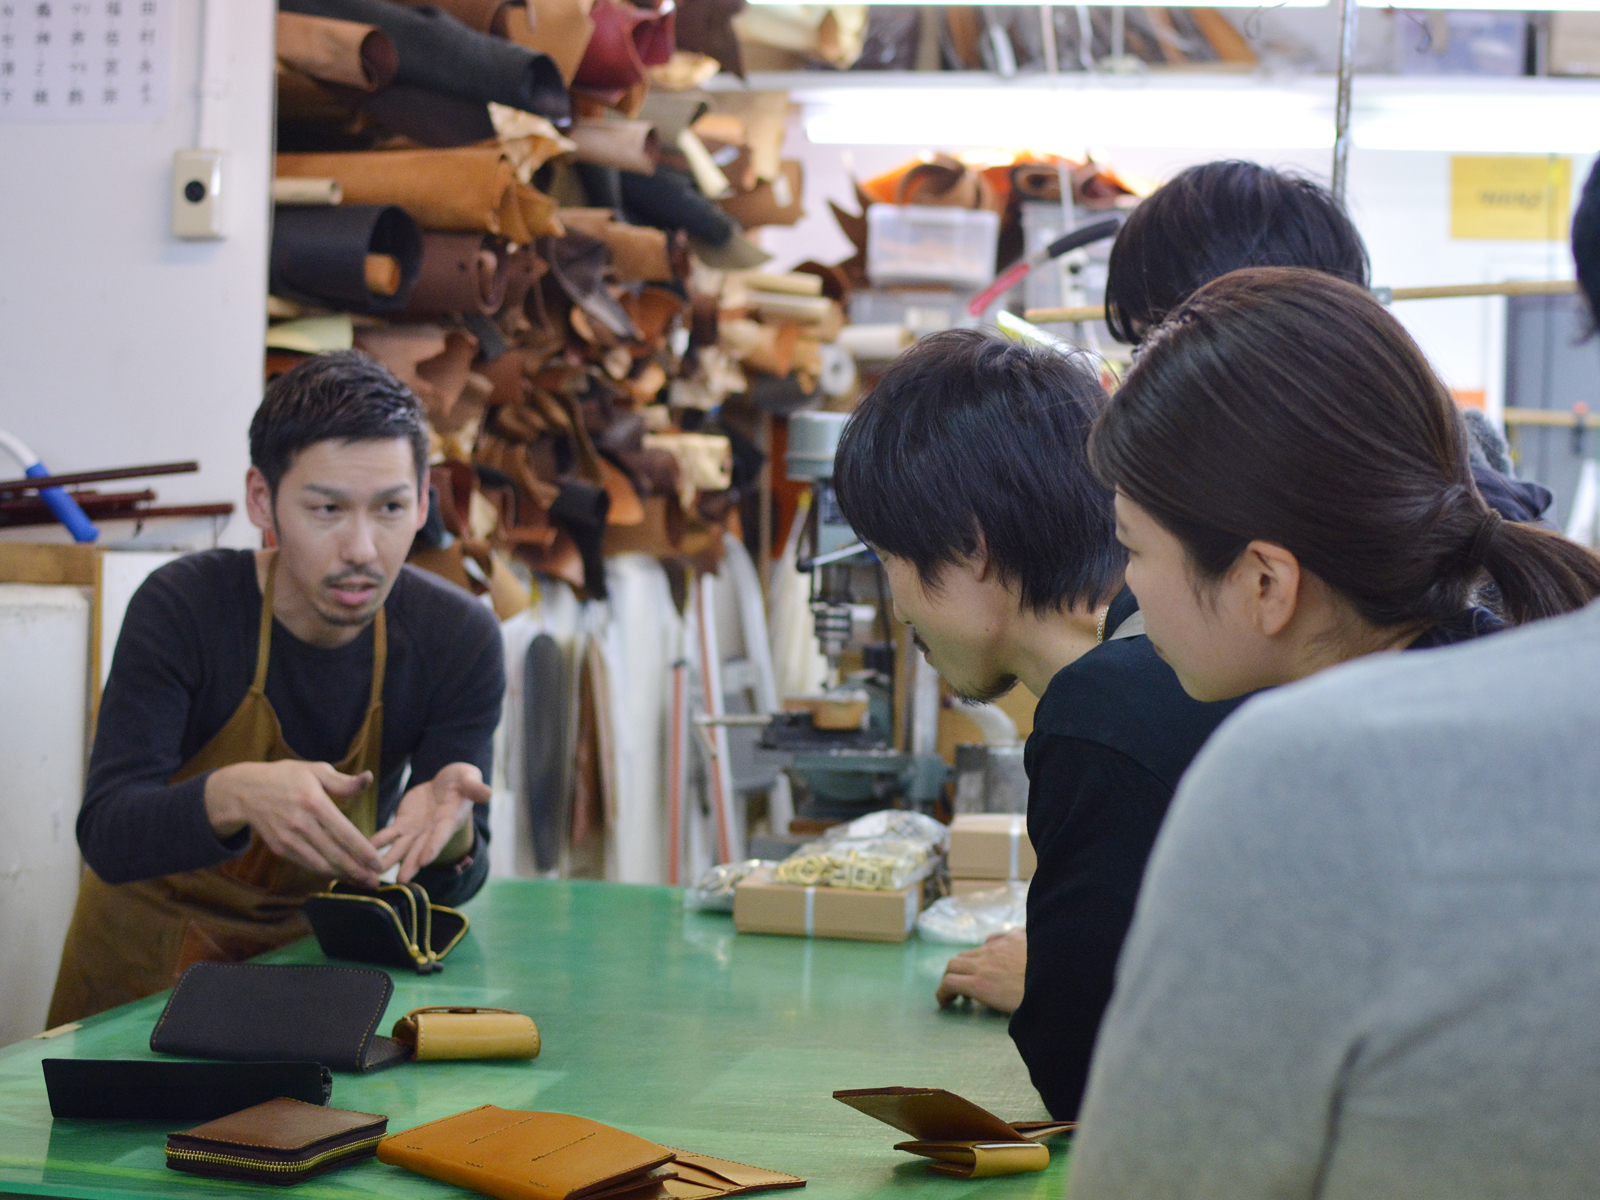 FACTRY SHOP お財布企画 品評会